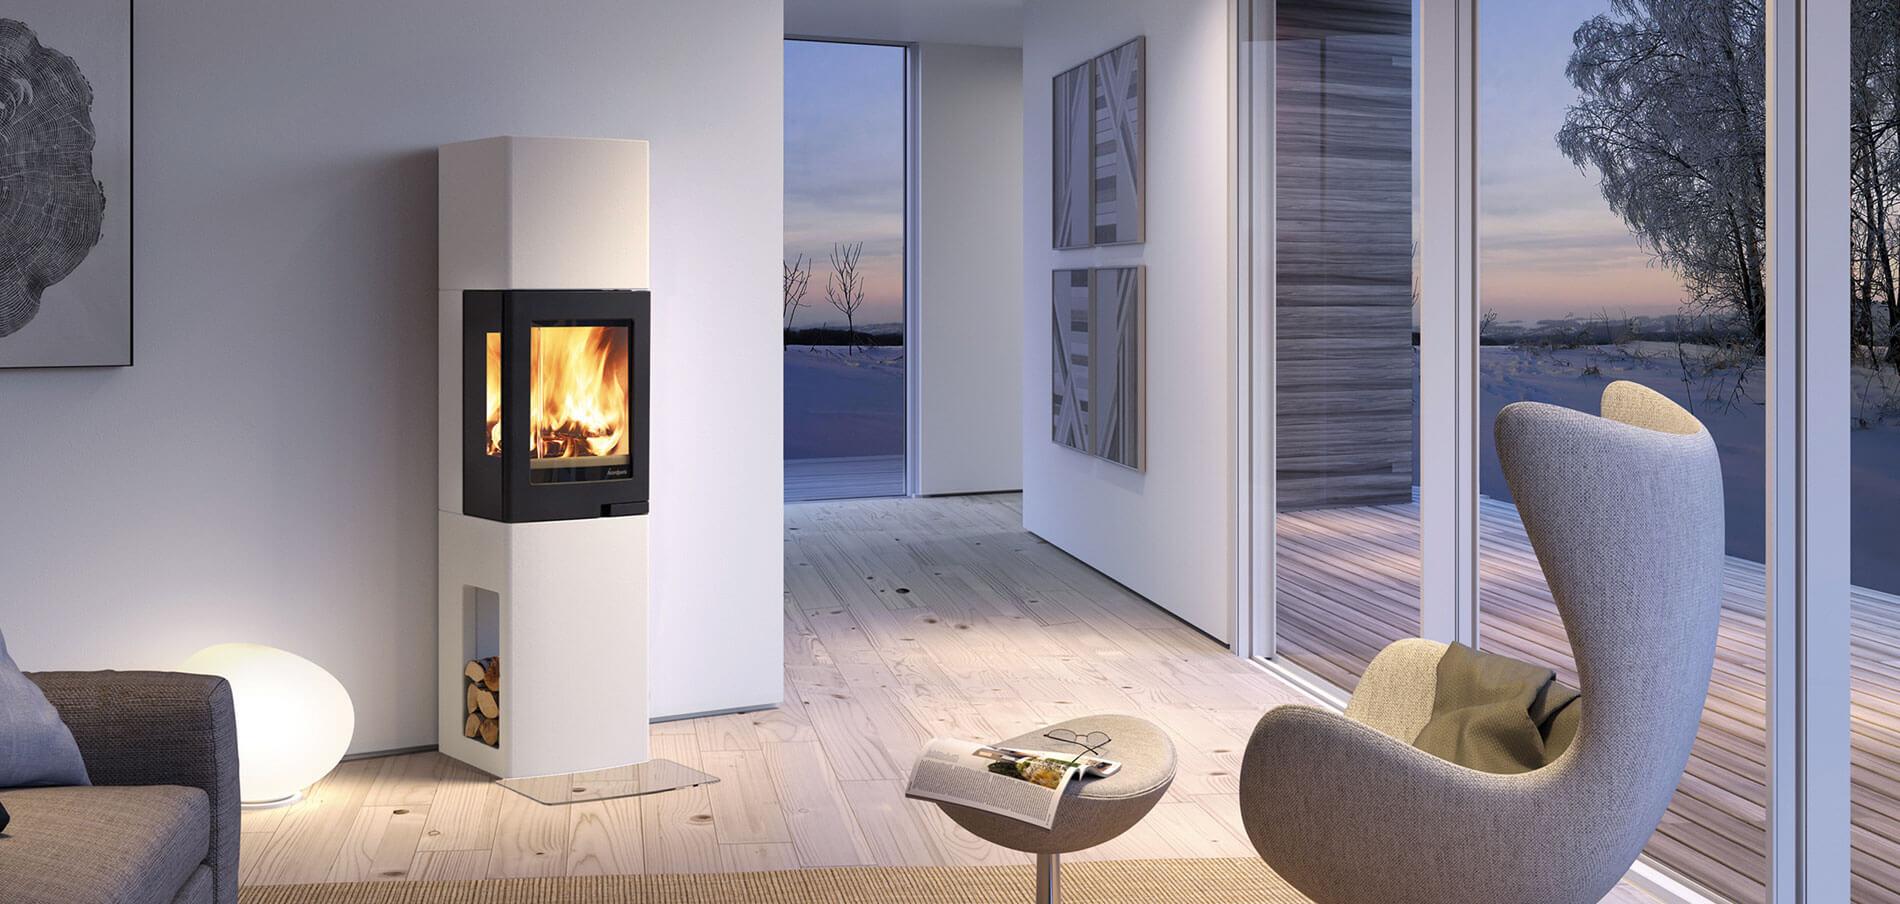 ouest granul ramonage entretien de po le granul s 44. Black Bedroom Furniture Sets. Home Design Ideas